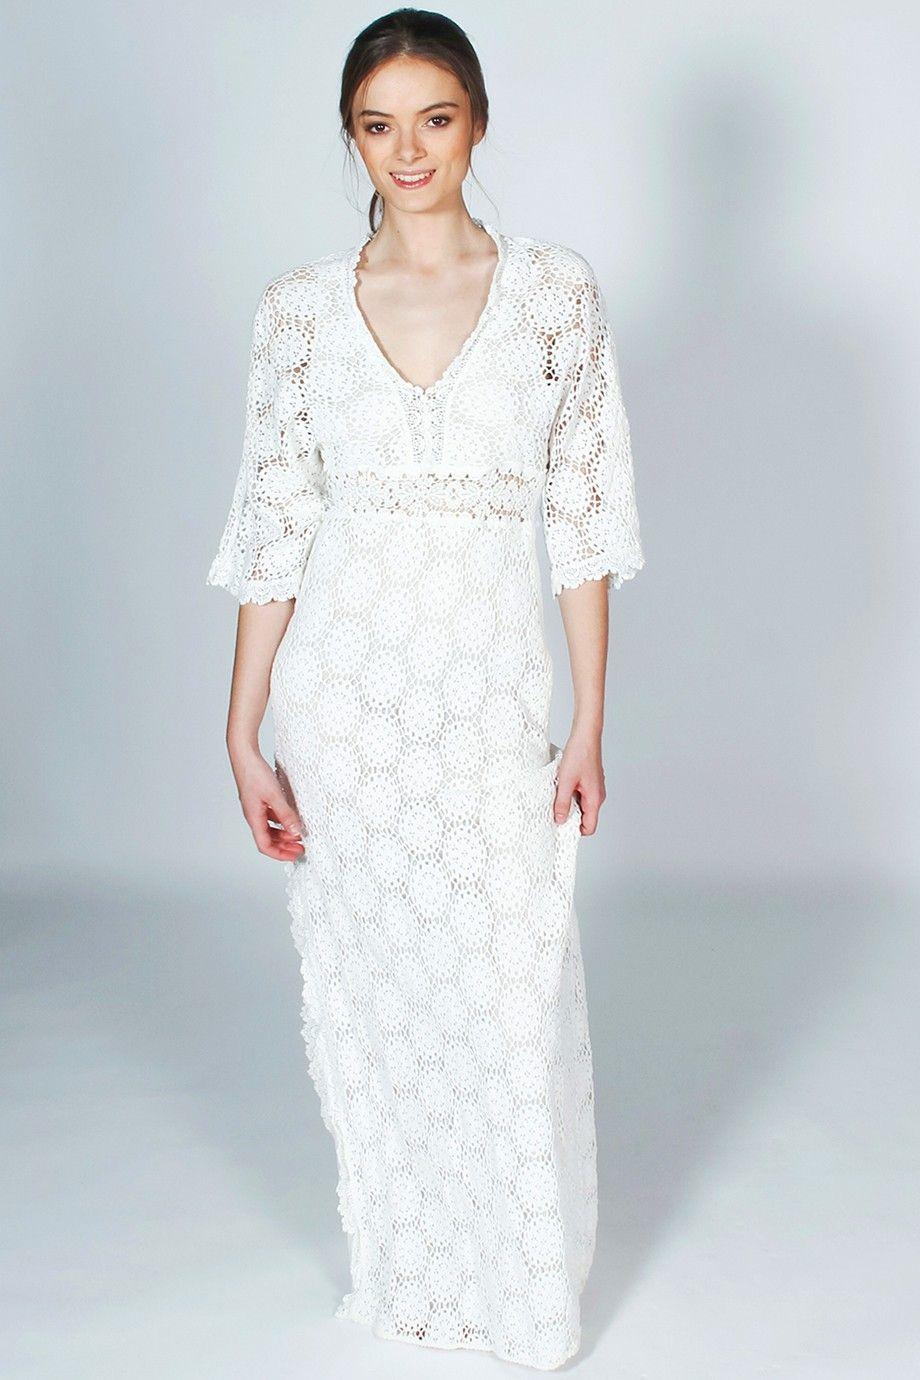 Robe longue blanche crochet LORRAINE Ba&sh manches 34